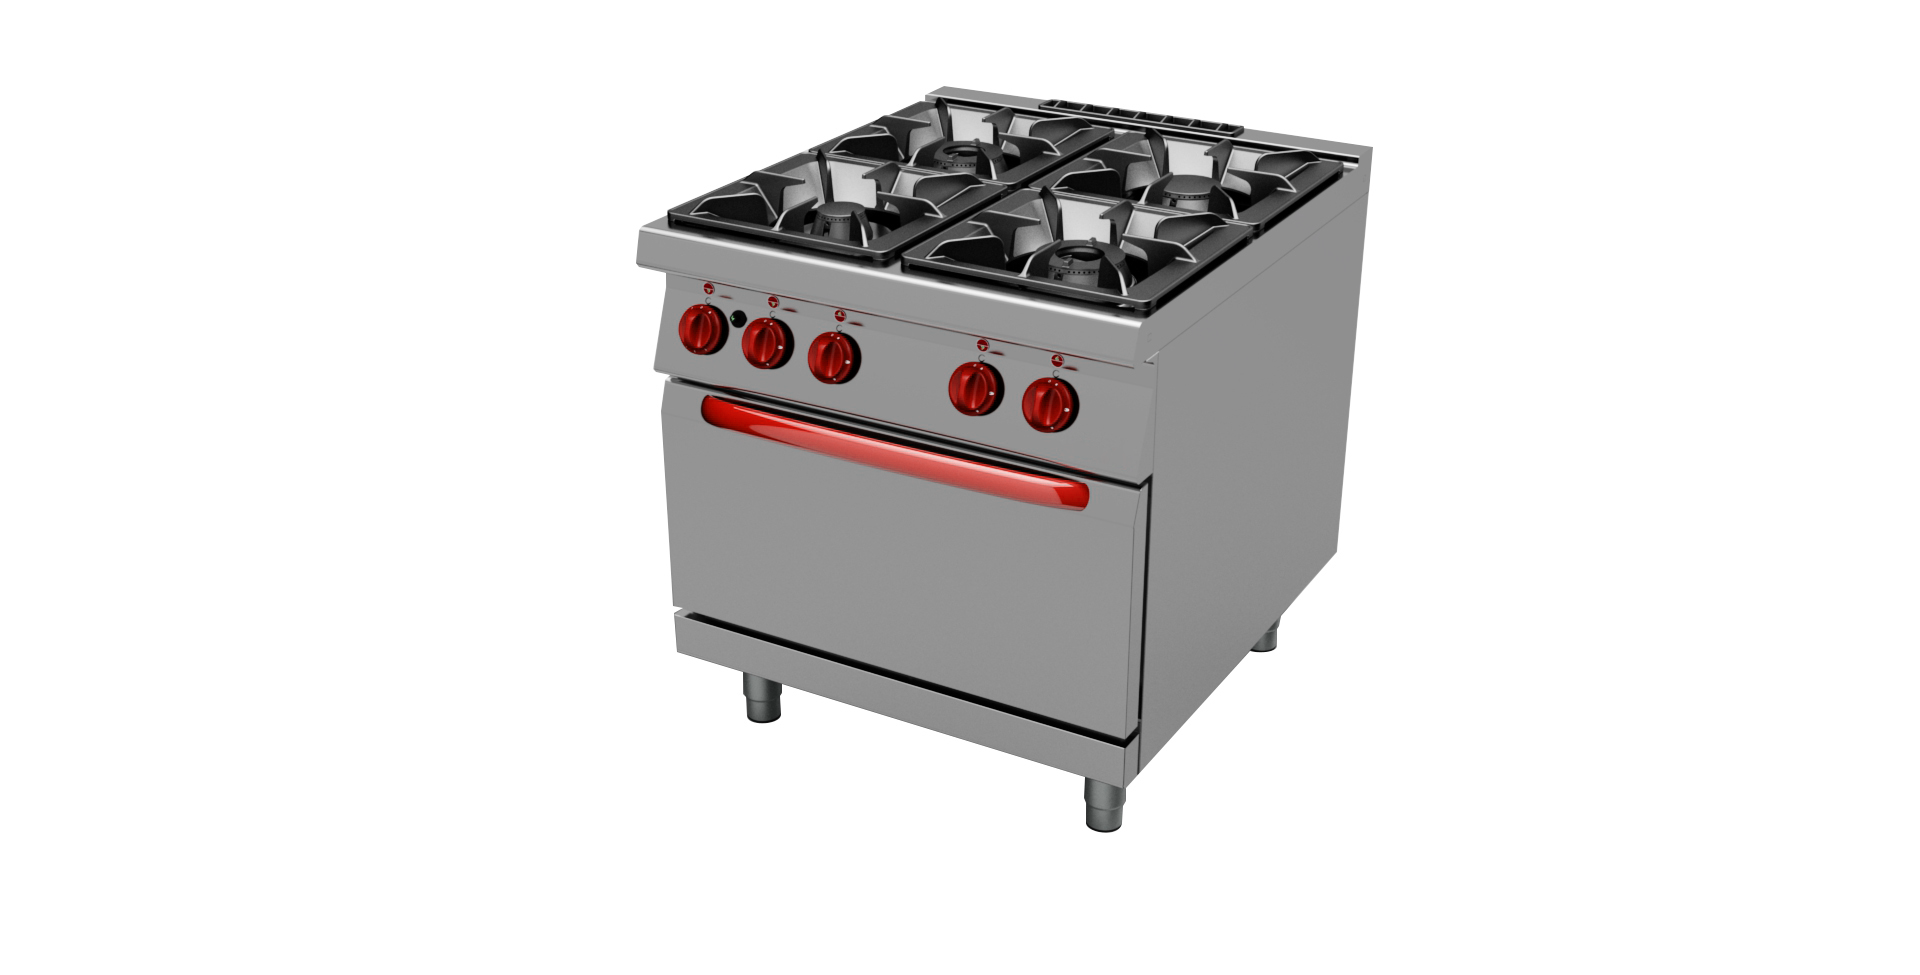 Cucina a gas 4 fuochi con o senza forno linea 700 - TecnoFood ...